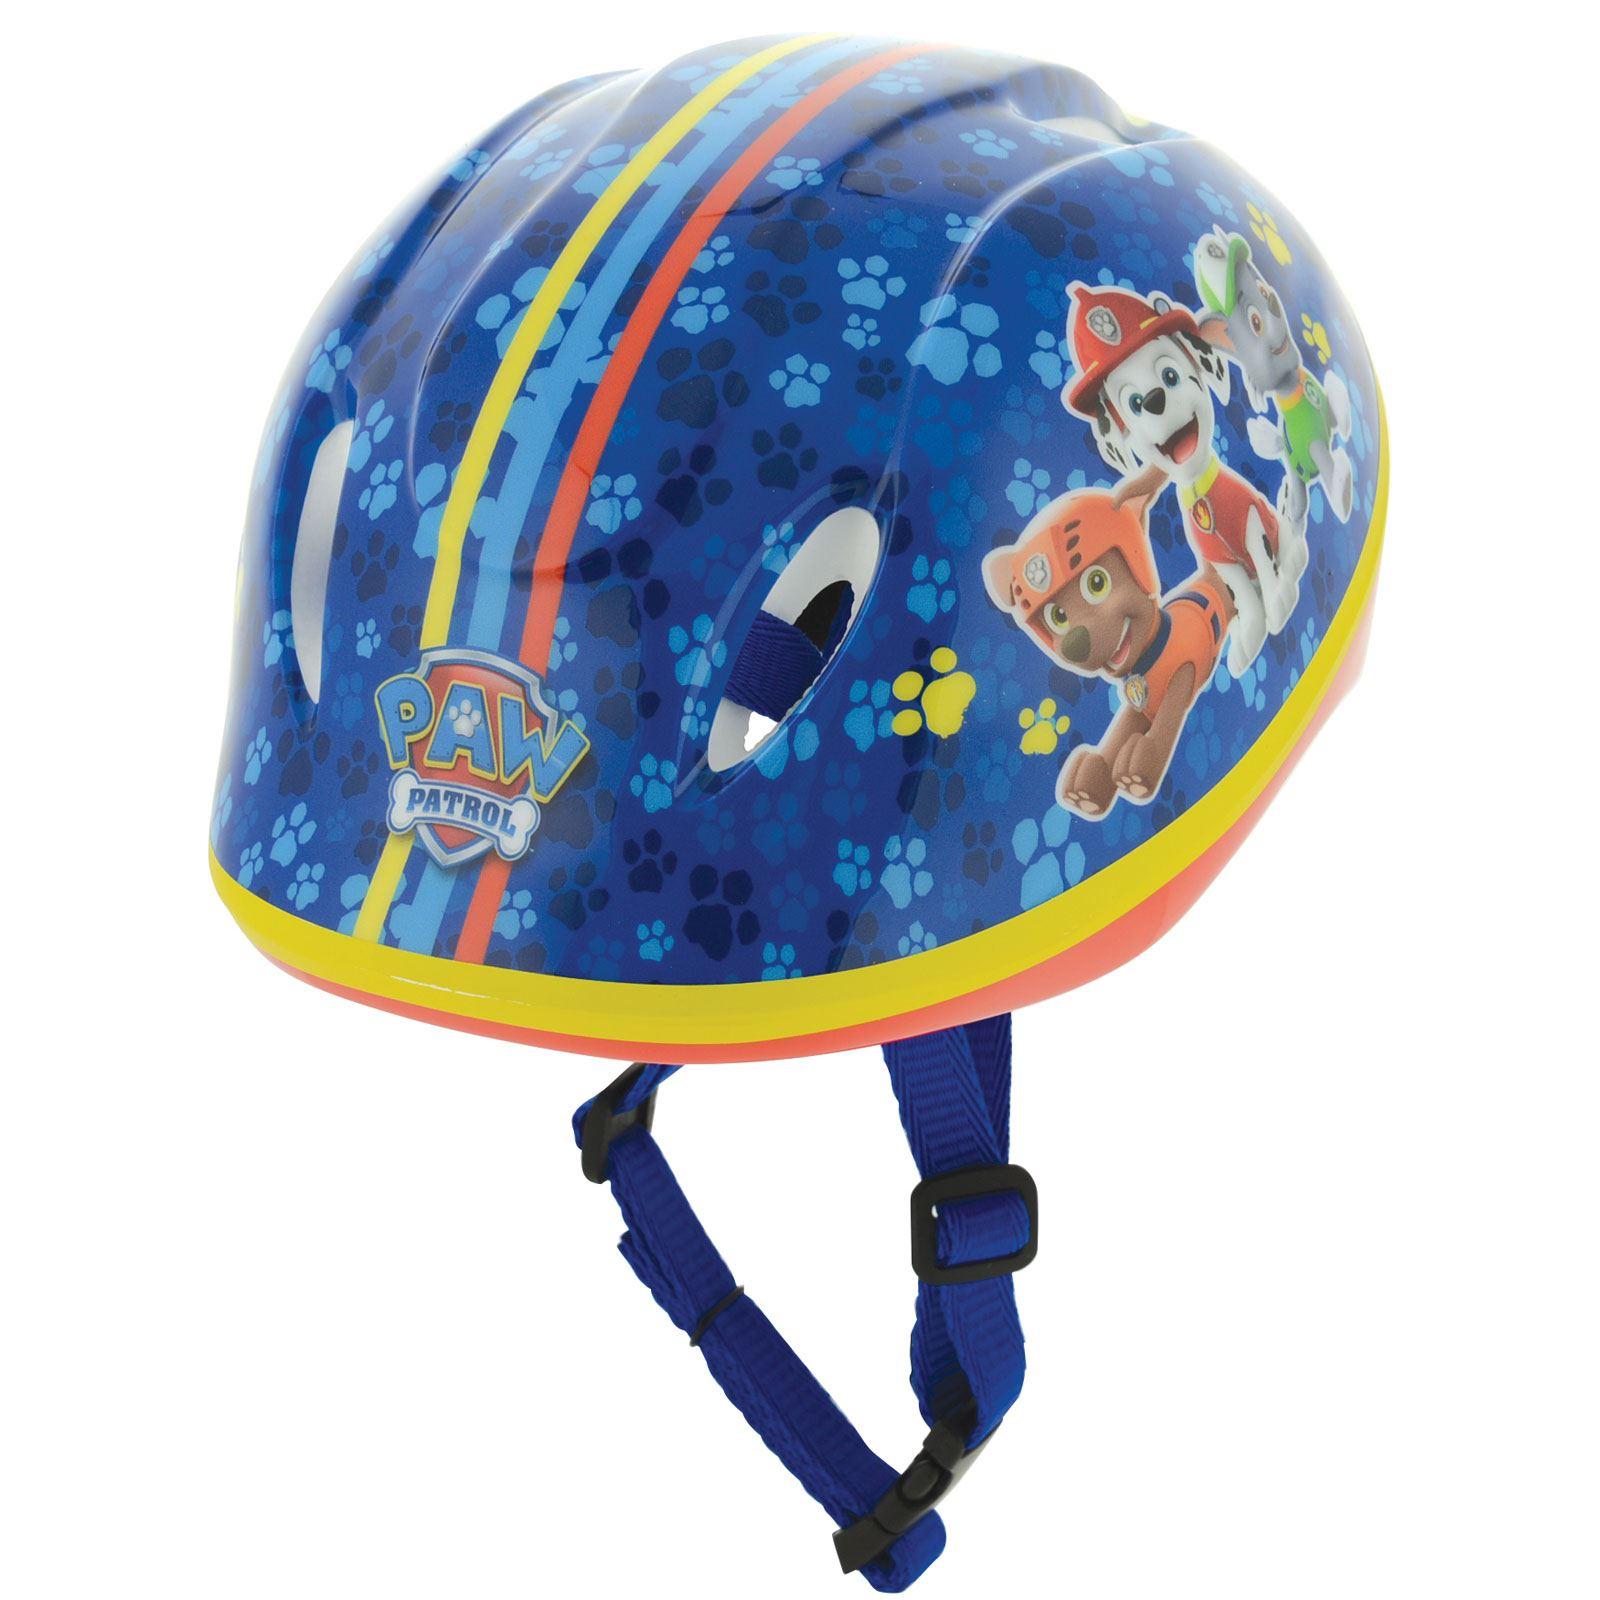 New Pig kids Bike Helmet 52-54cm